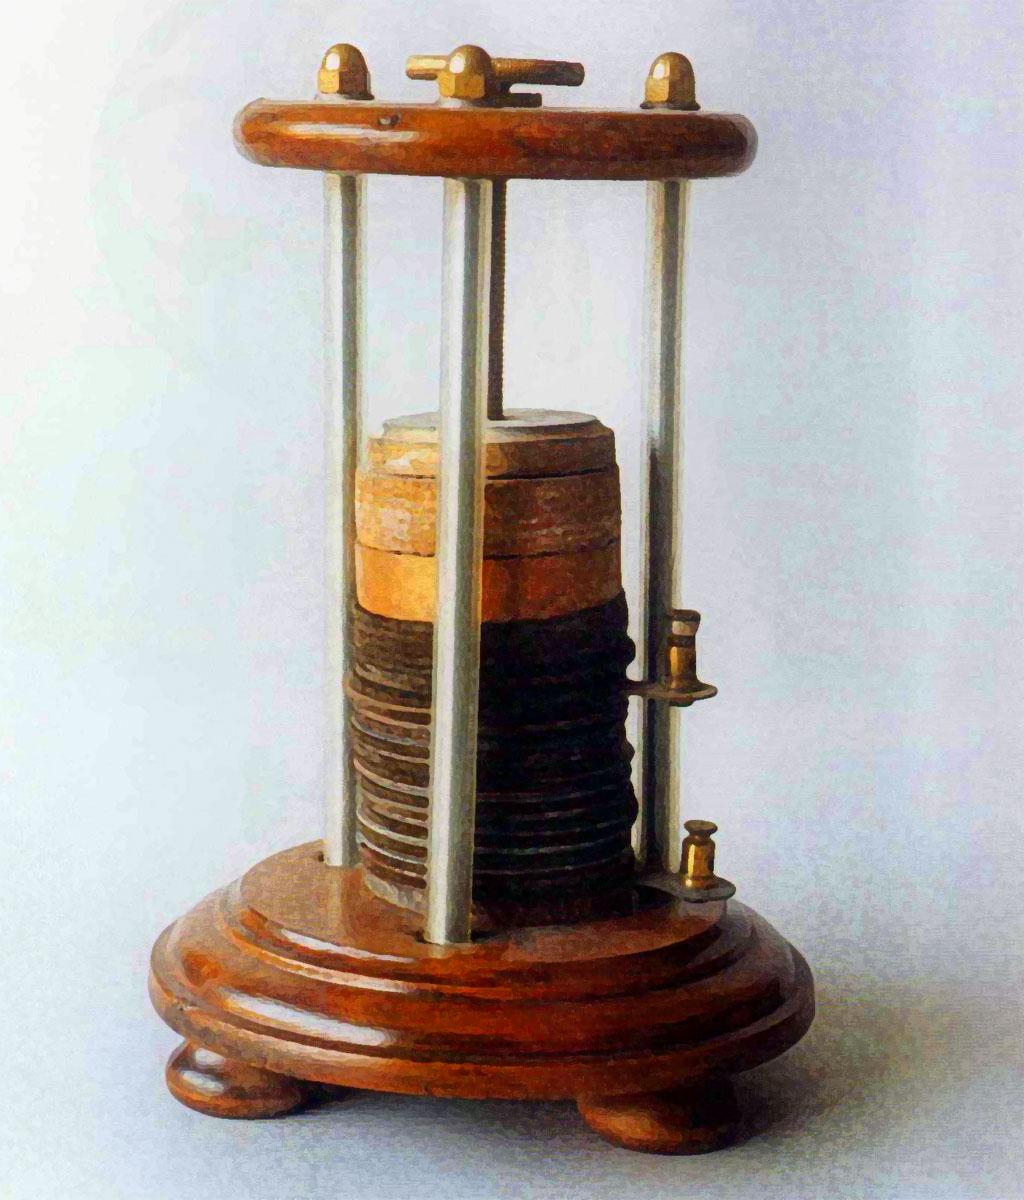 pila voltaica di Alessandro Volta